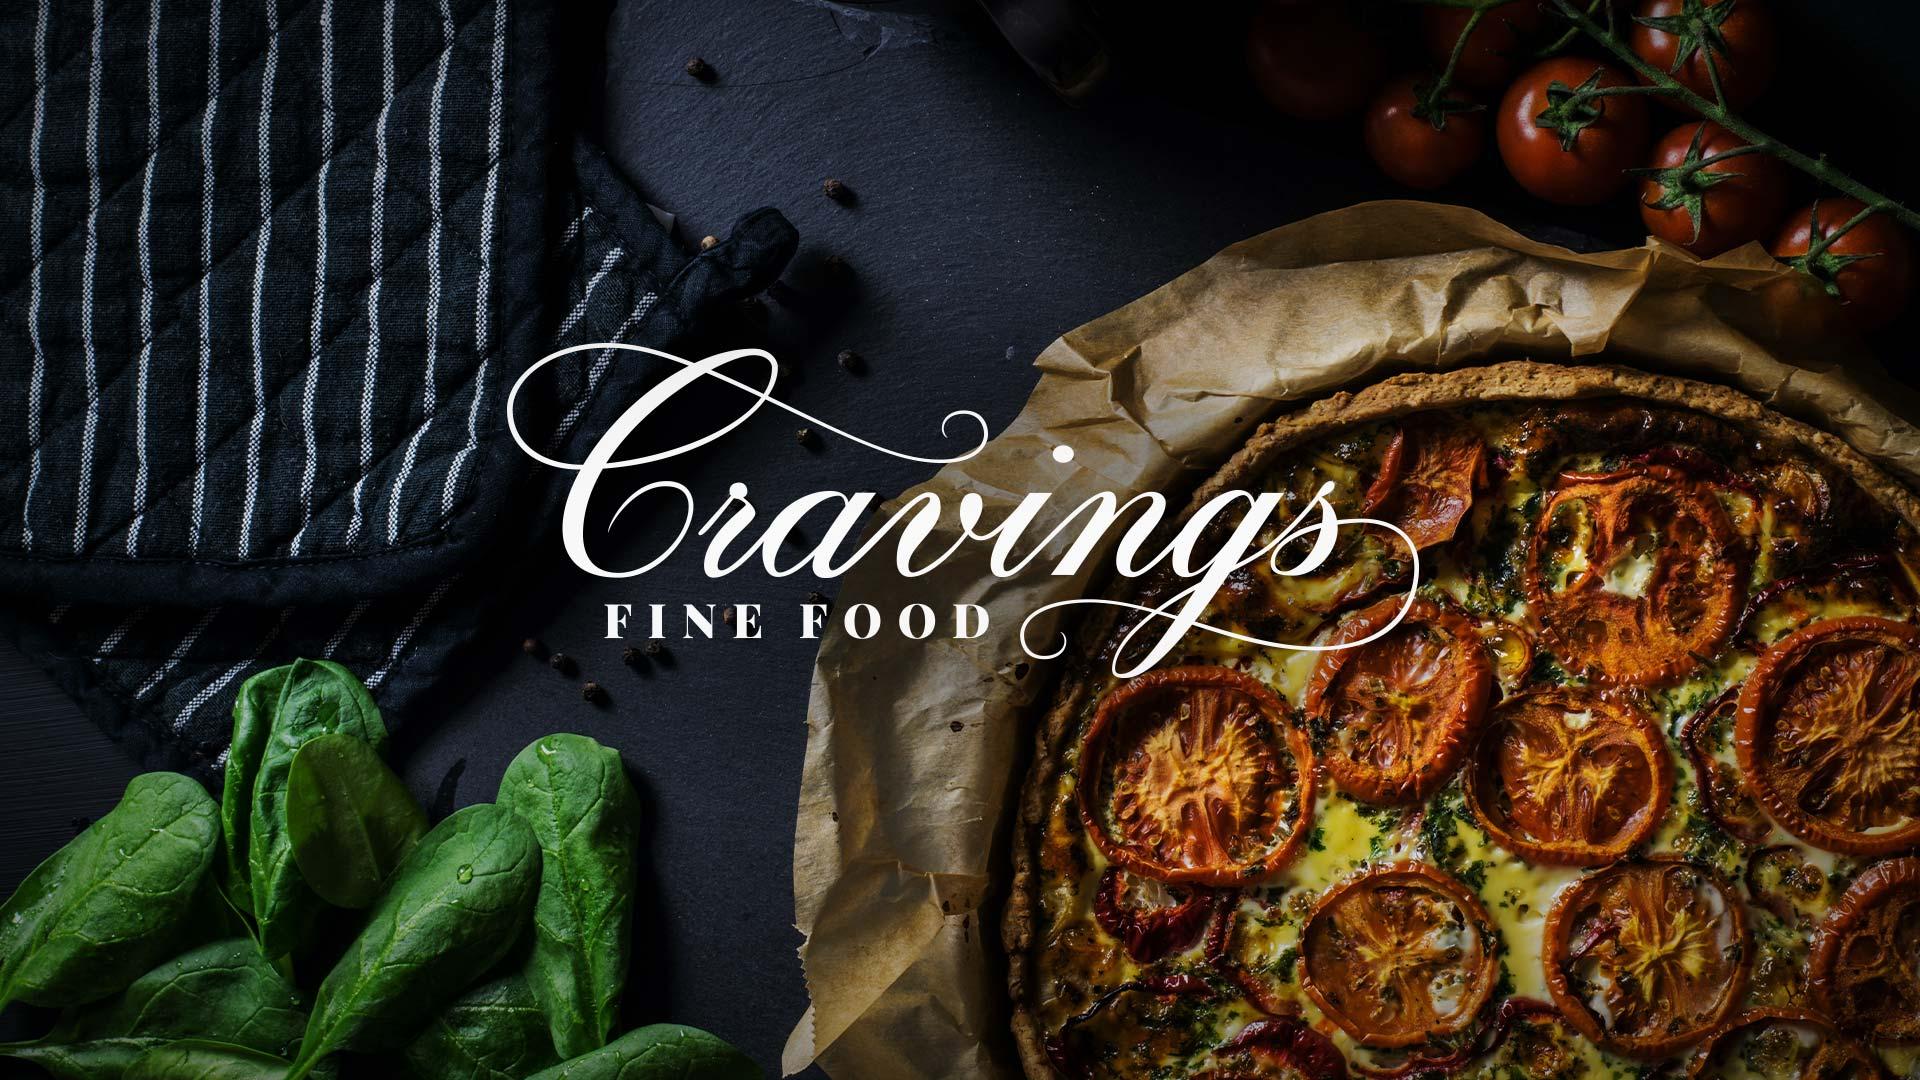 cravings fine food case study header